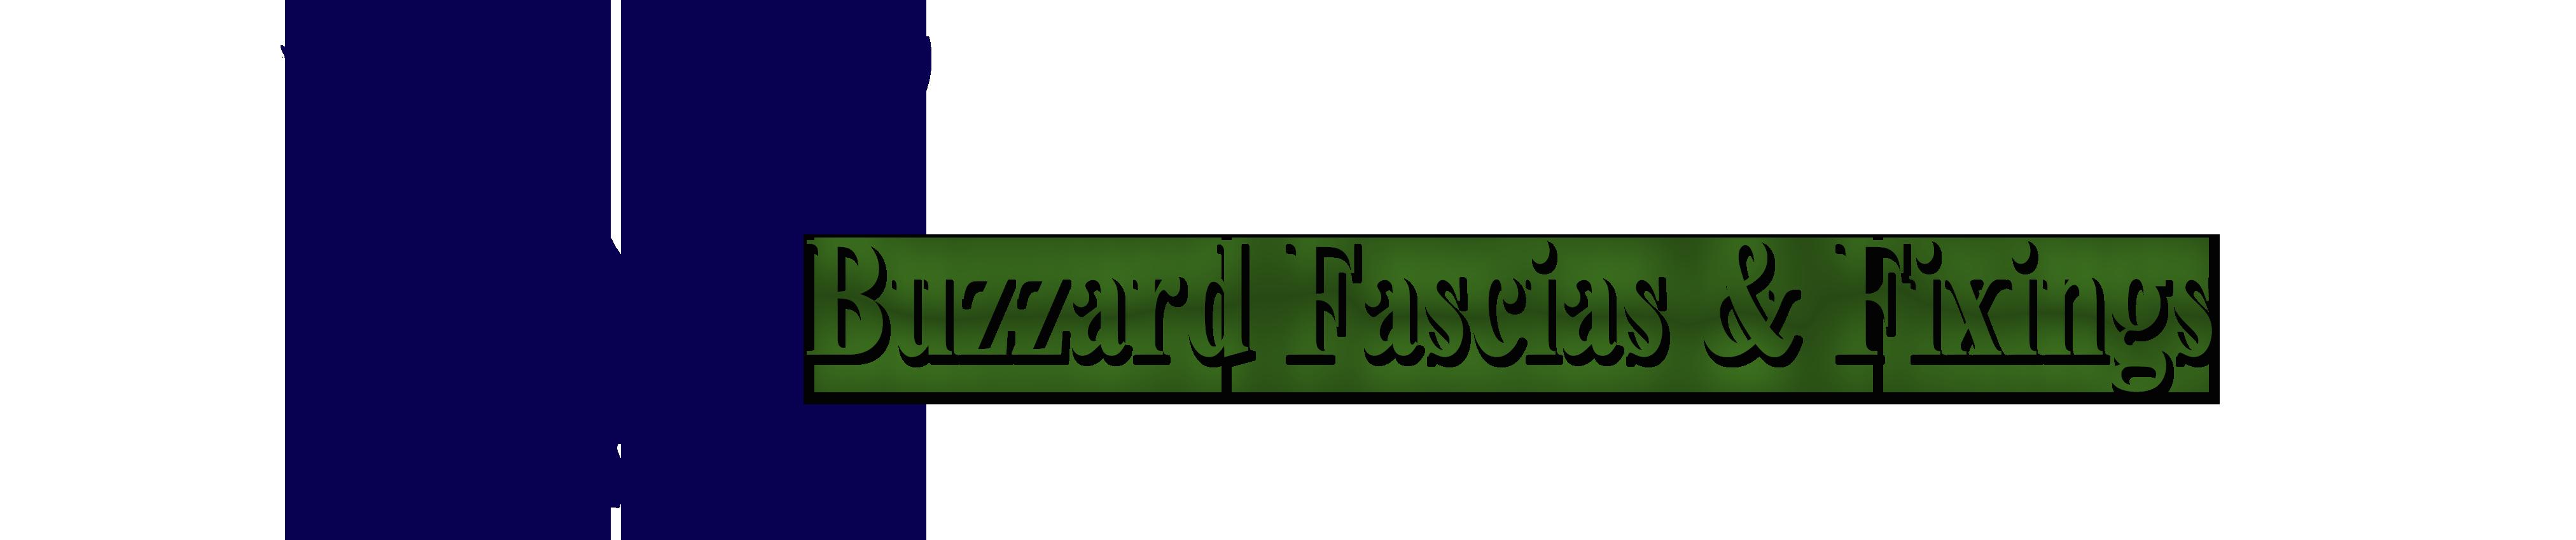 Buzzard Fascias and Fixings - uPVC Fascias, soffits